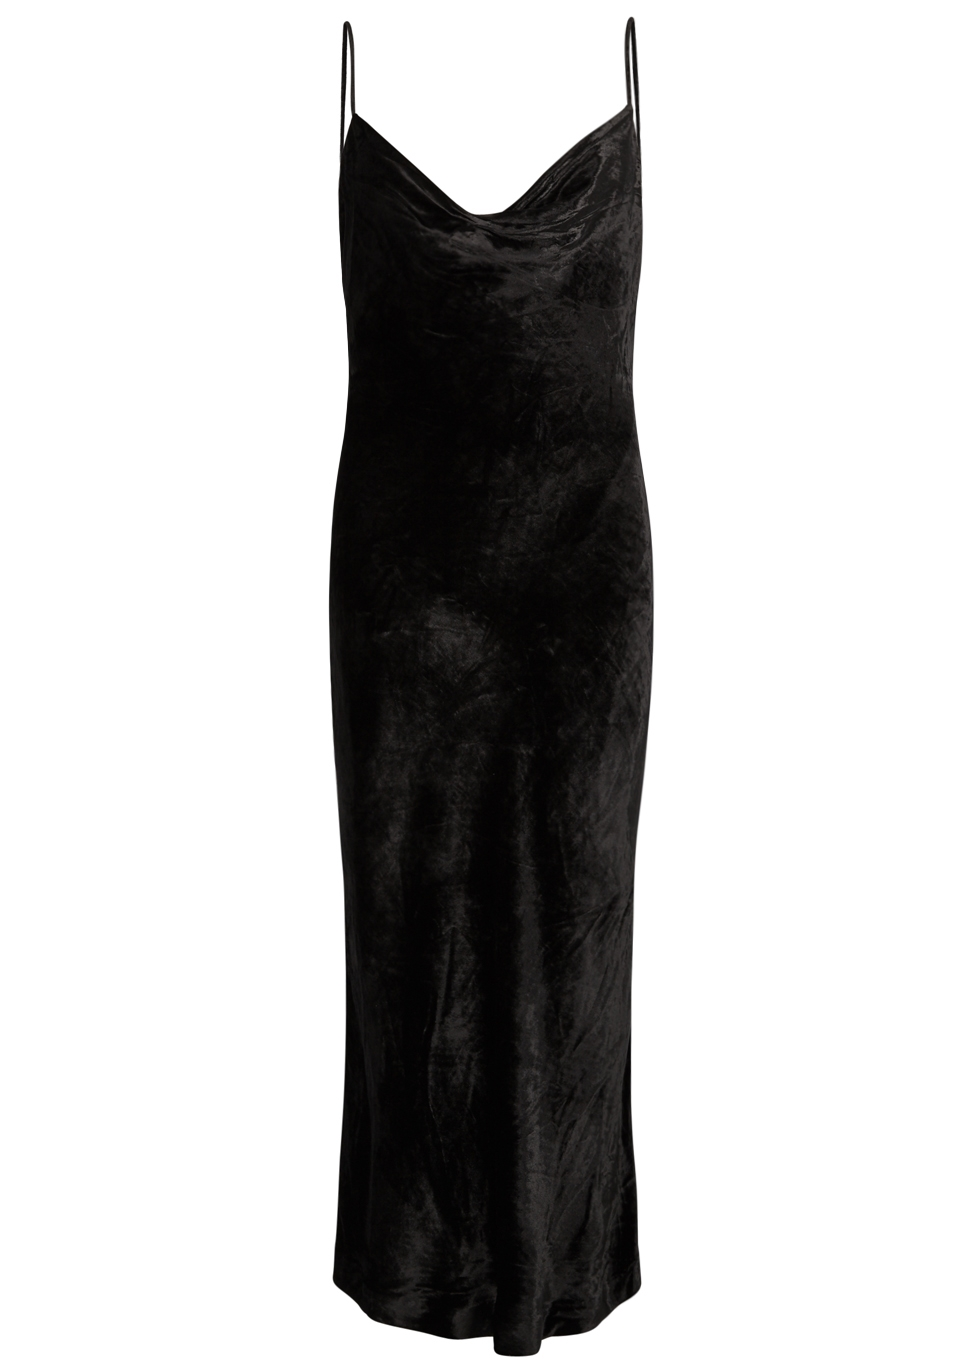 REBECCA VALLANCE KARA BIAS-CUT VELVET SLIP DRESS